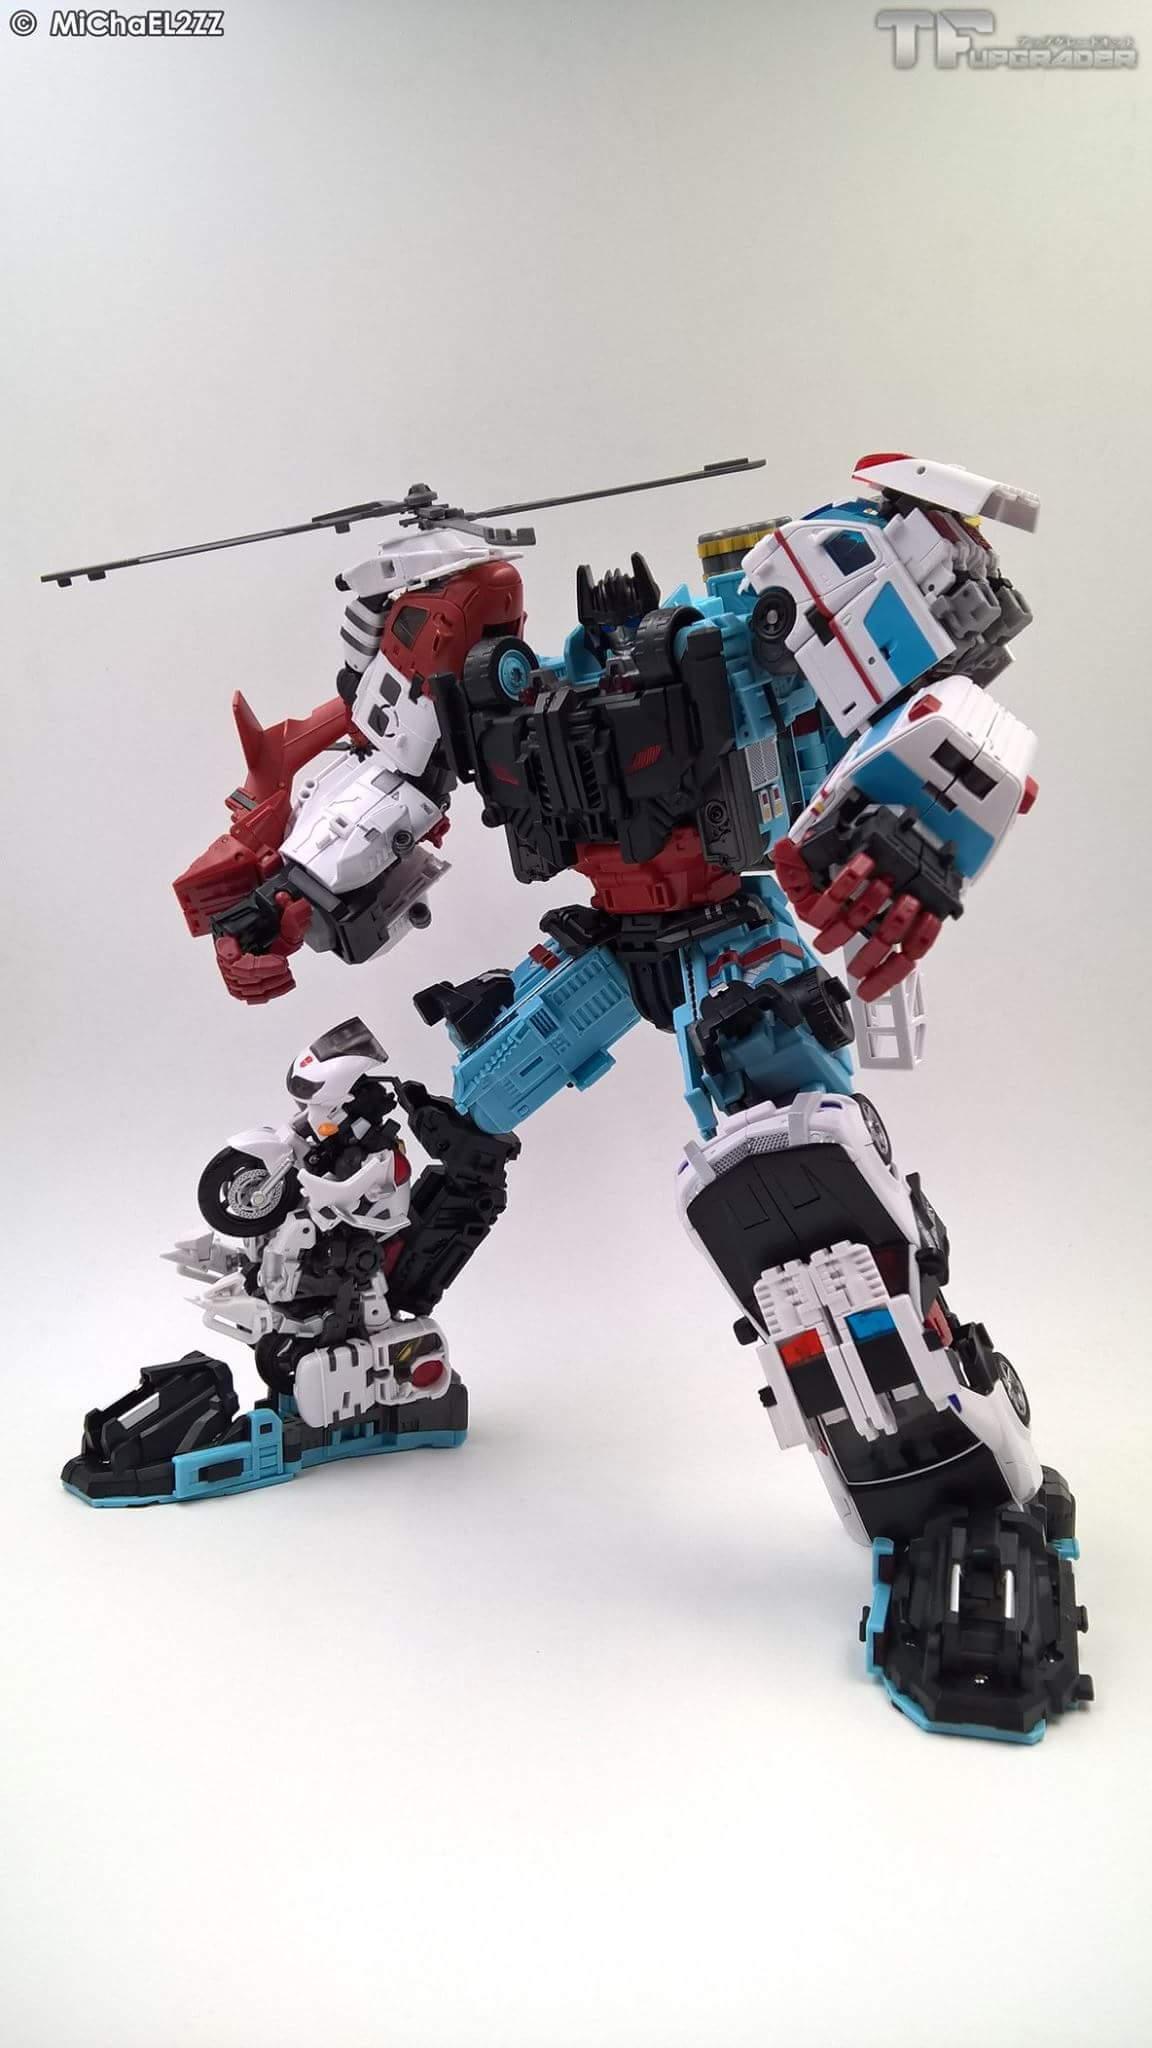 [MakeToys] Produit Tiers - Jouet MTCM-04 Guardia (aka Protectobots - Defensor/Defenso) - Page 4 54ST00x5